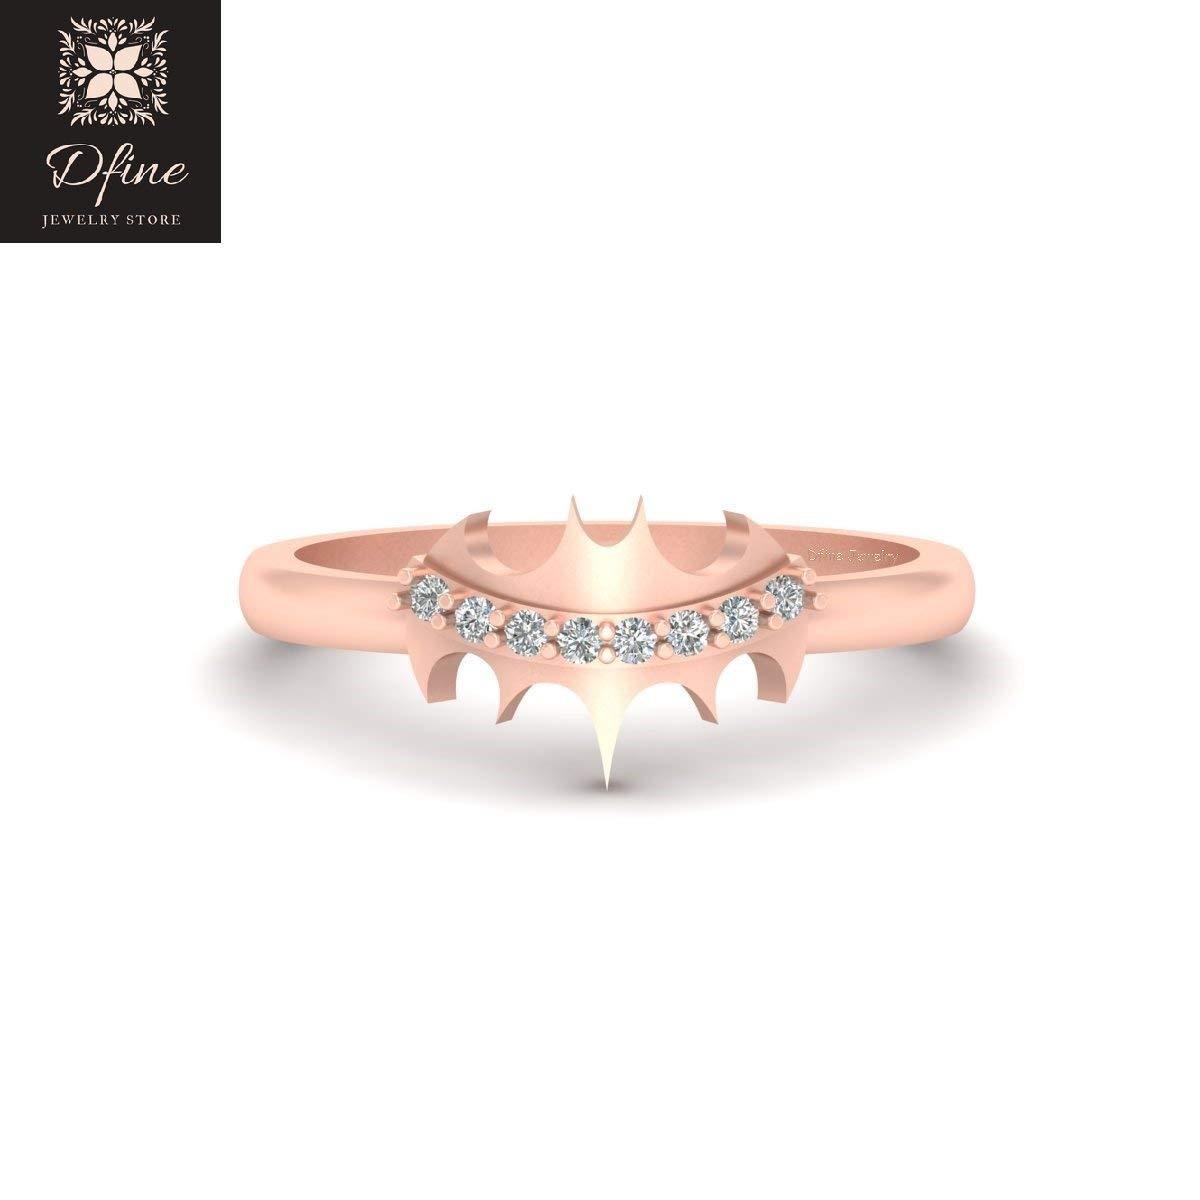 Superhero Fantasy Batman Inspired Wedding Ring Solid 14k Rose Gold Batgirl Ring Jewelry